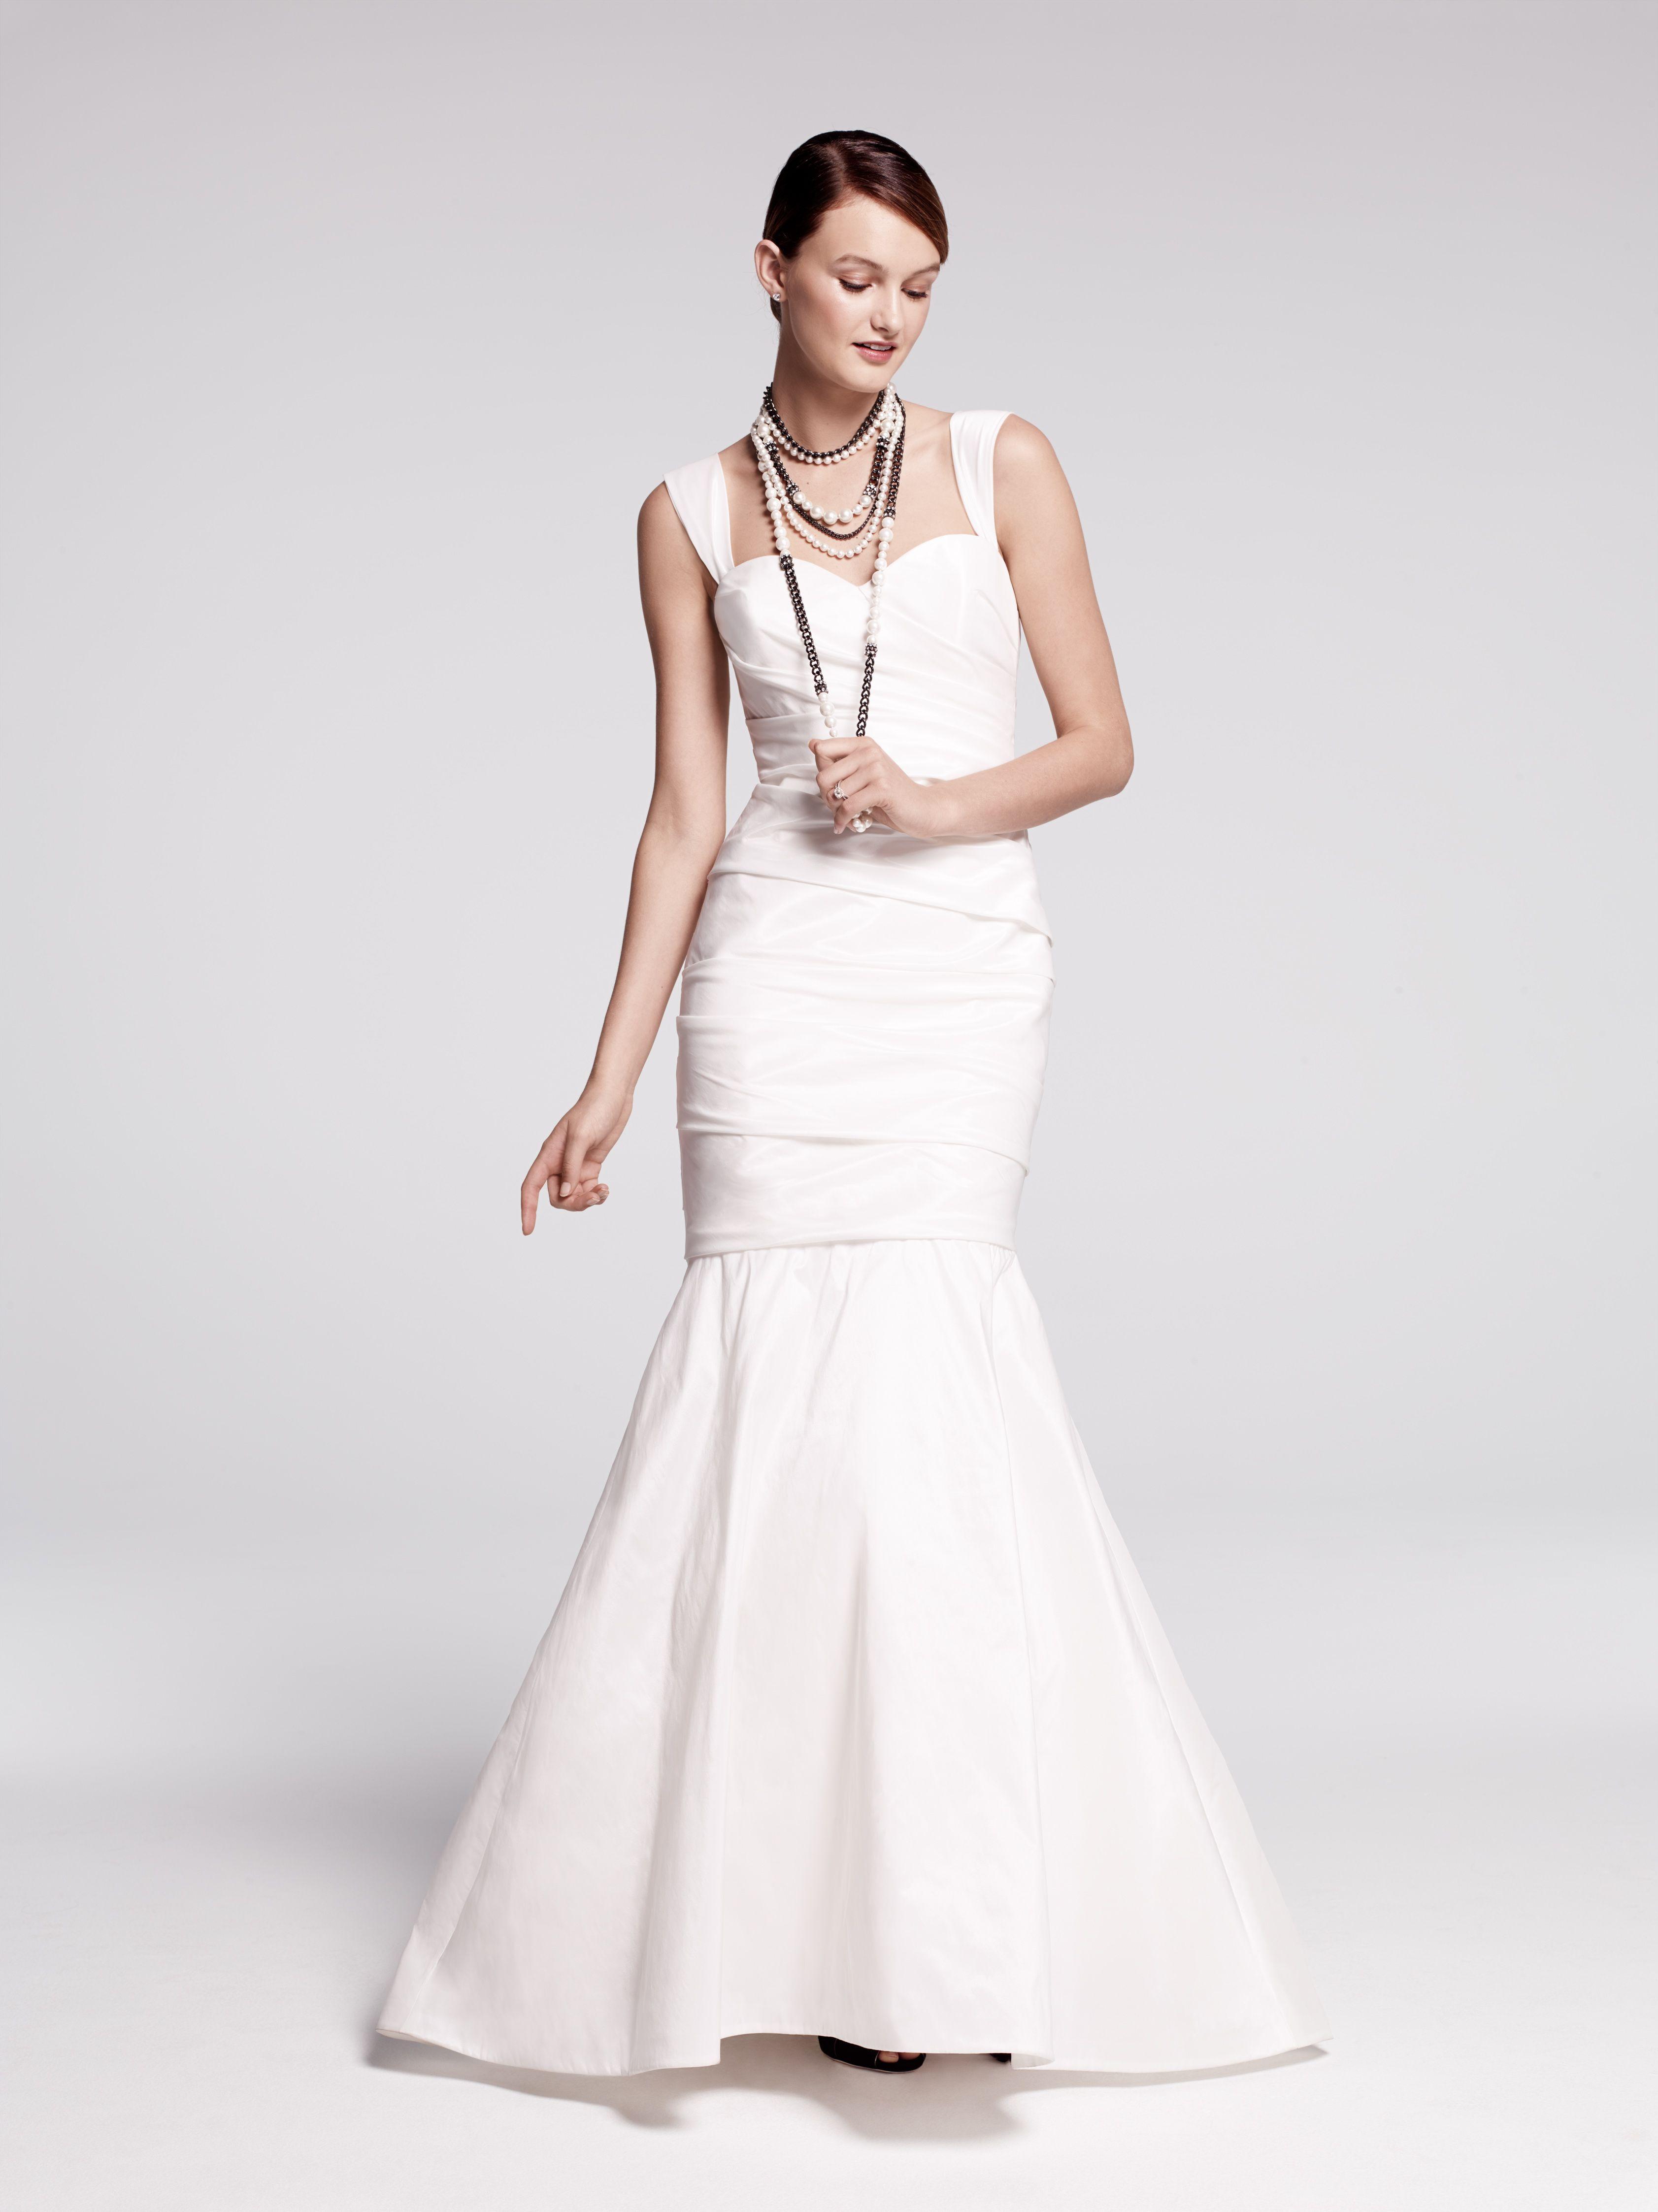 Nordstrom wedding dress  Nouvelle Amsale taffeta mermaid gown exclusive to Nordstrom Wedding